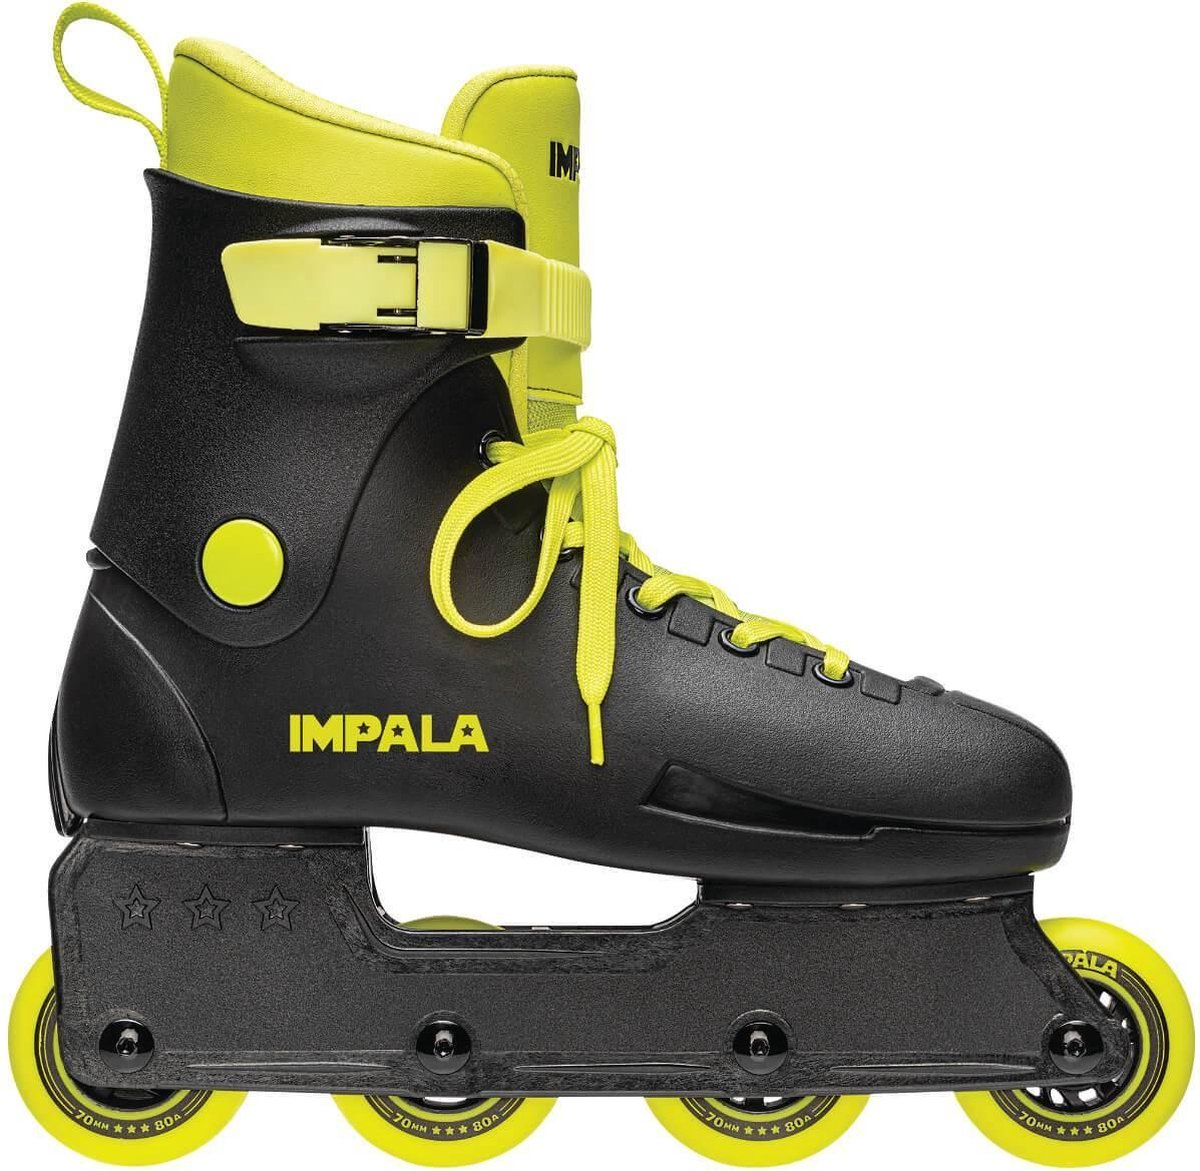 Impala Lightspeed inline skates 70mm black / fluoro